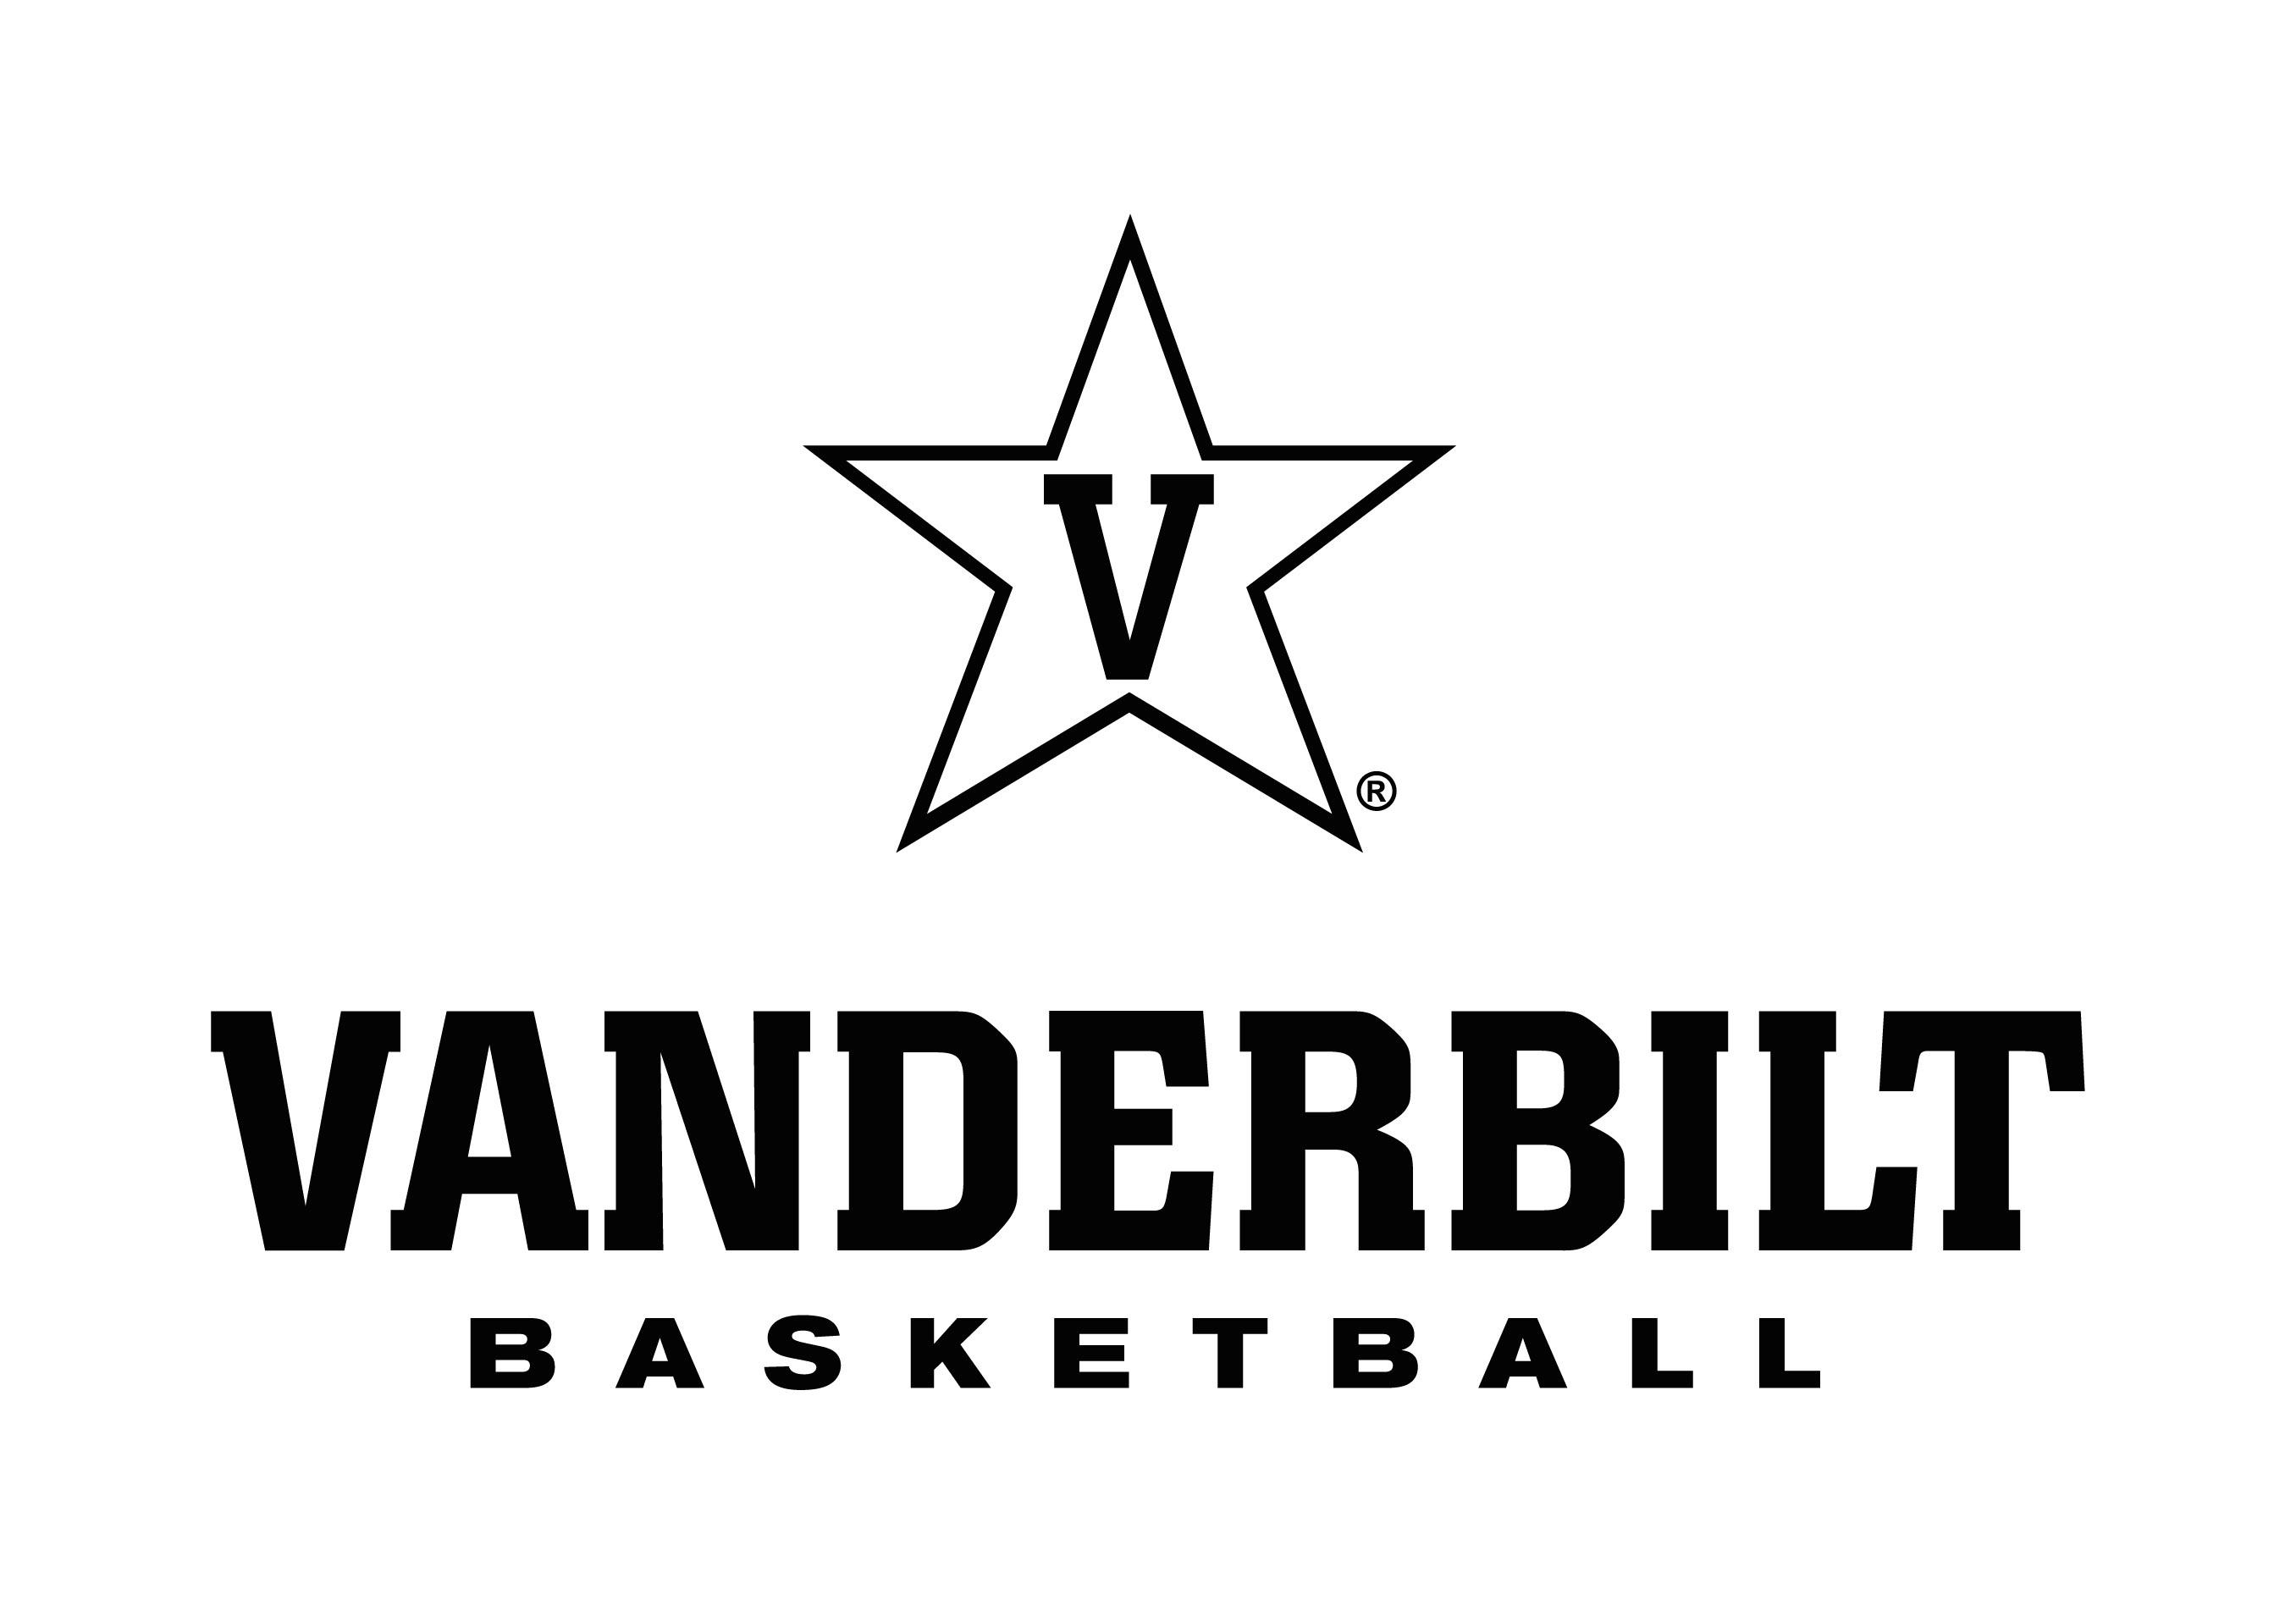 Cowgill 6 Uk Basketball Visits Vanderbilt Tuesday: Vanderbilt University